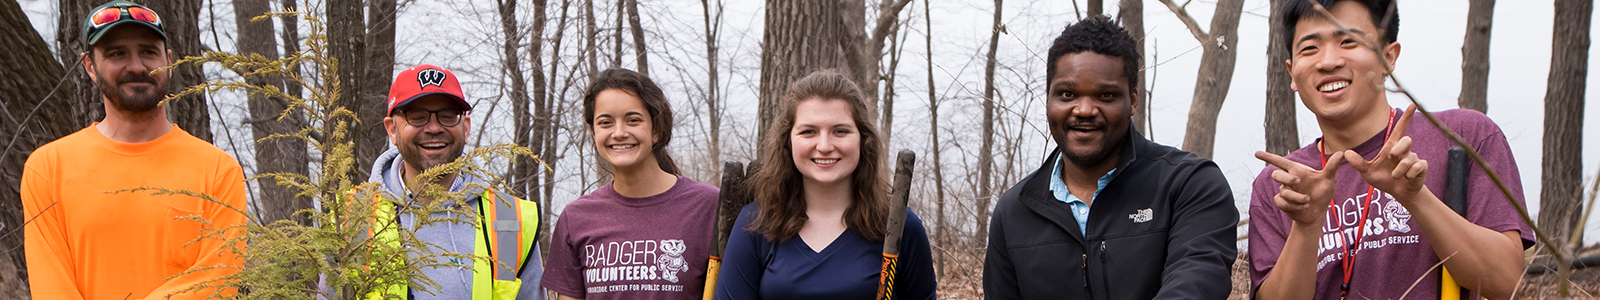 Badger Volunteers at Shorewood Hills